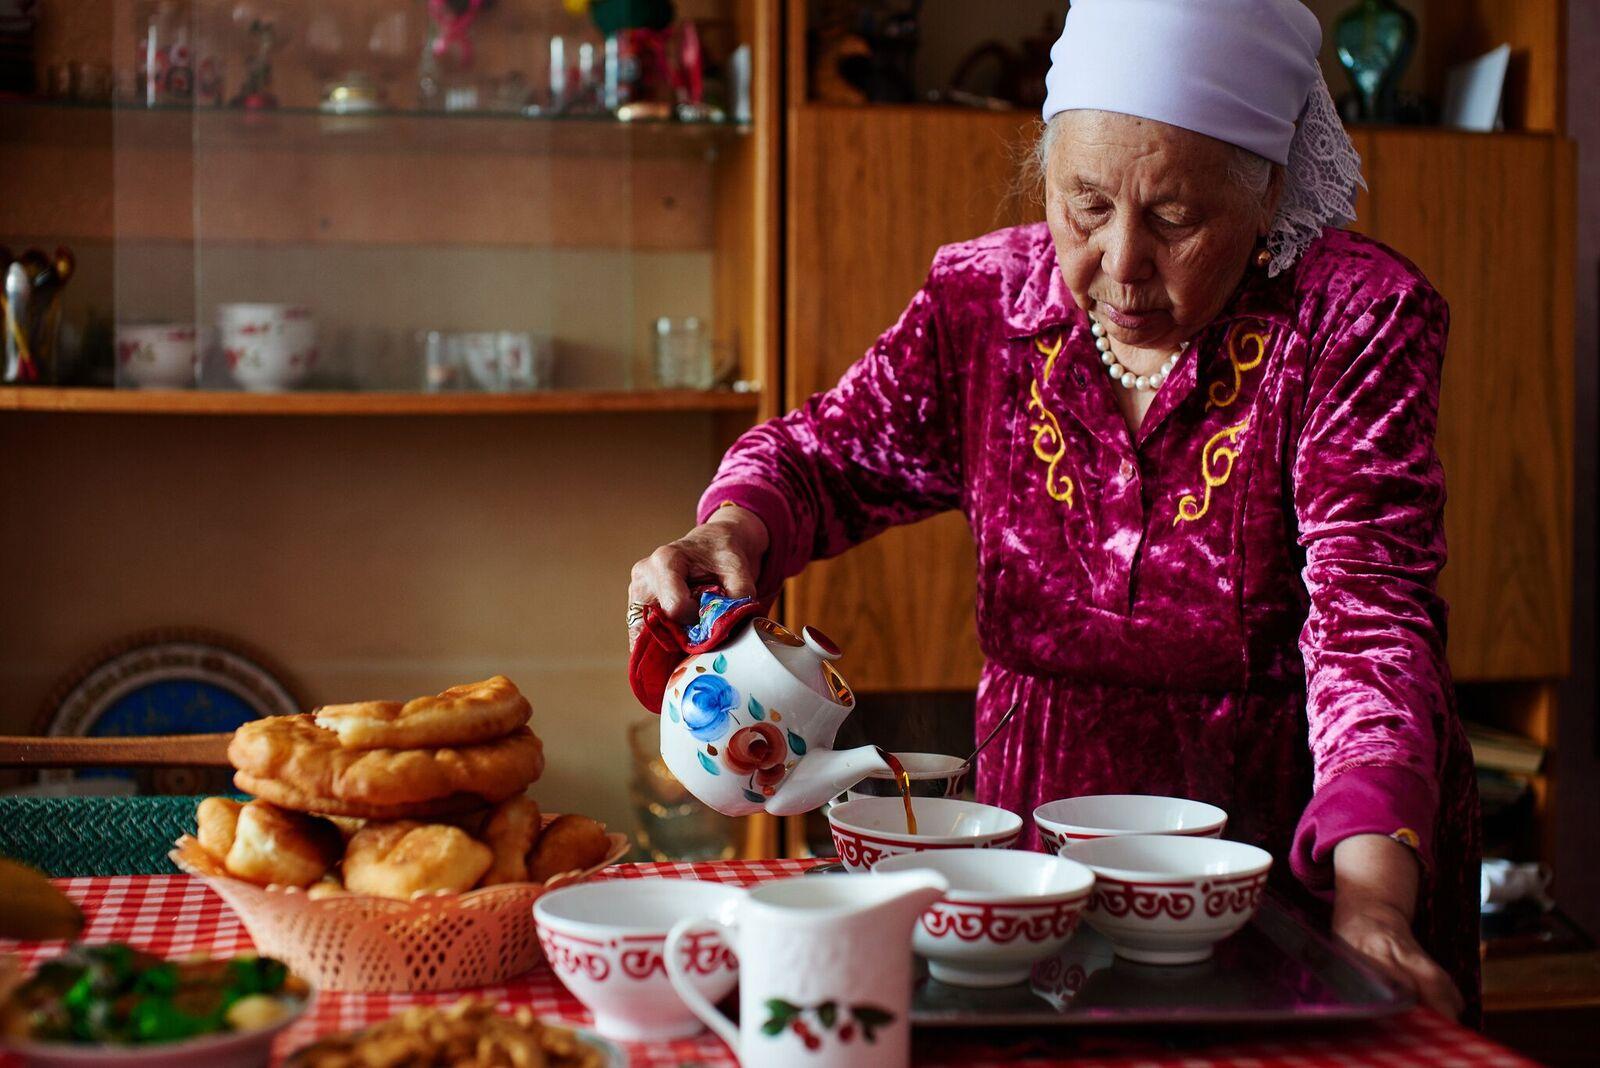 WTN170919_Kzach_grandmotherpouringtea-1.